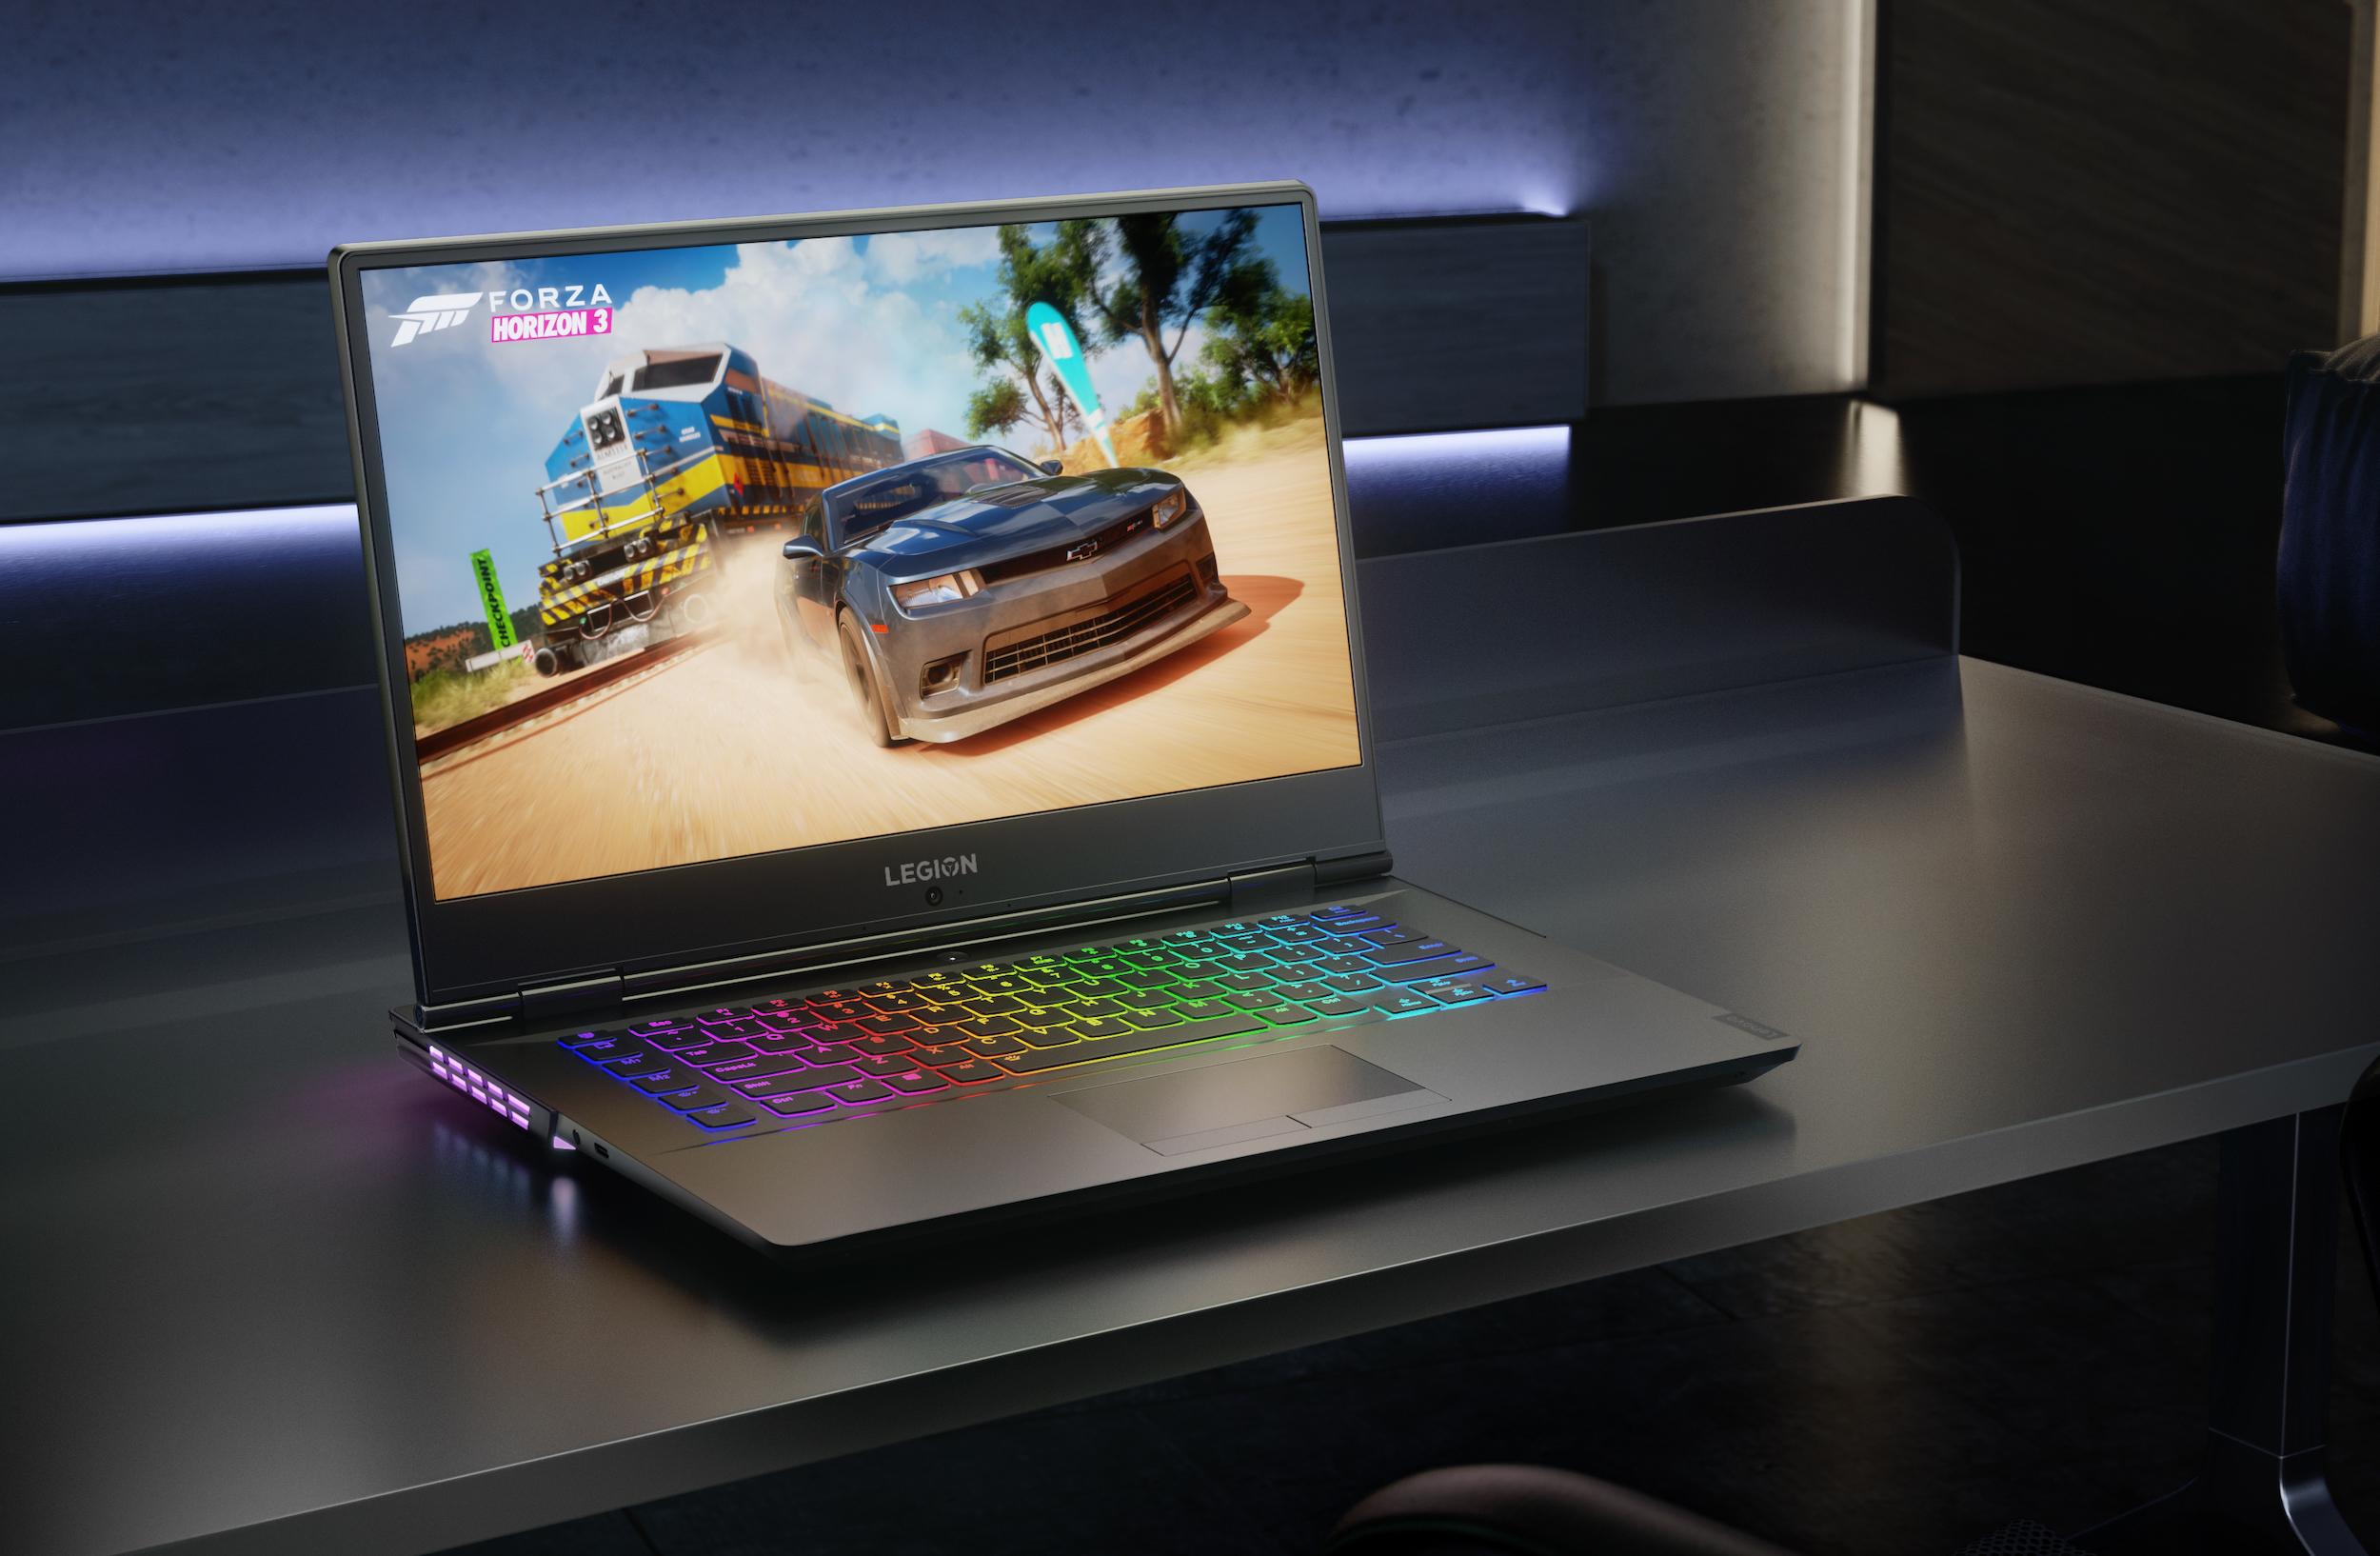 lenovo legion y740 laptop 364x205 - Lenovo upgrades its Legion and IdeaPad gaming laptops